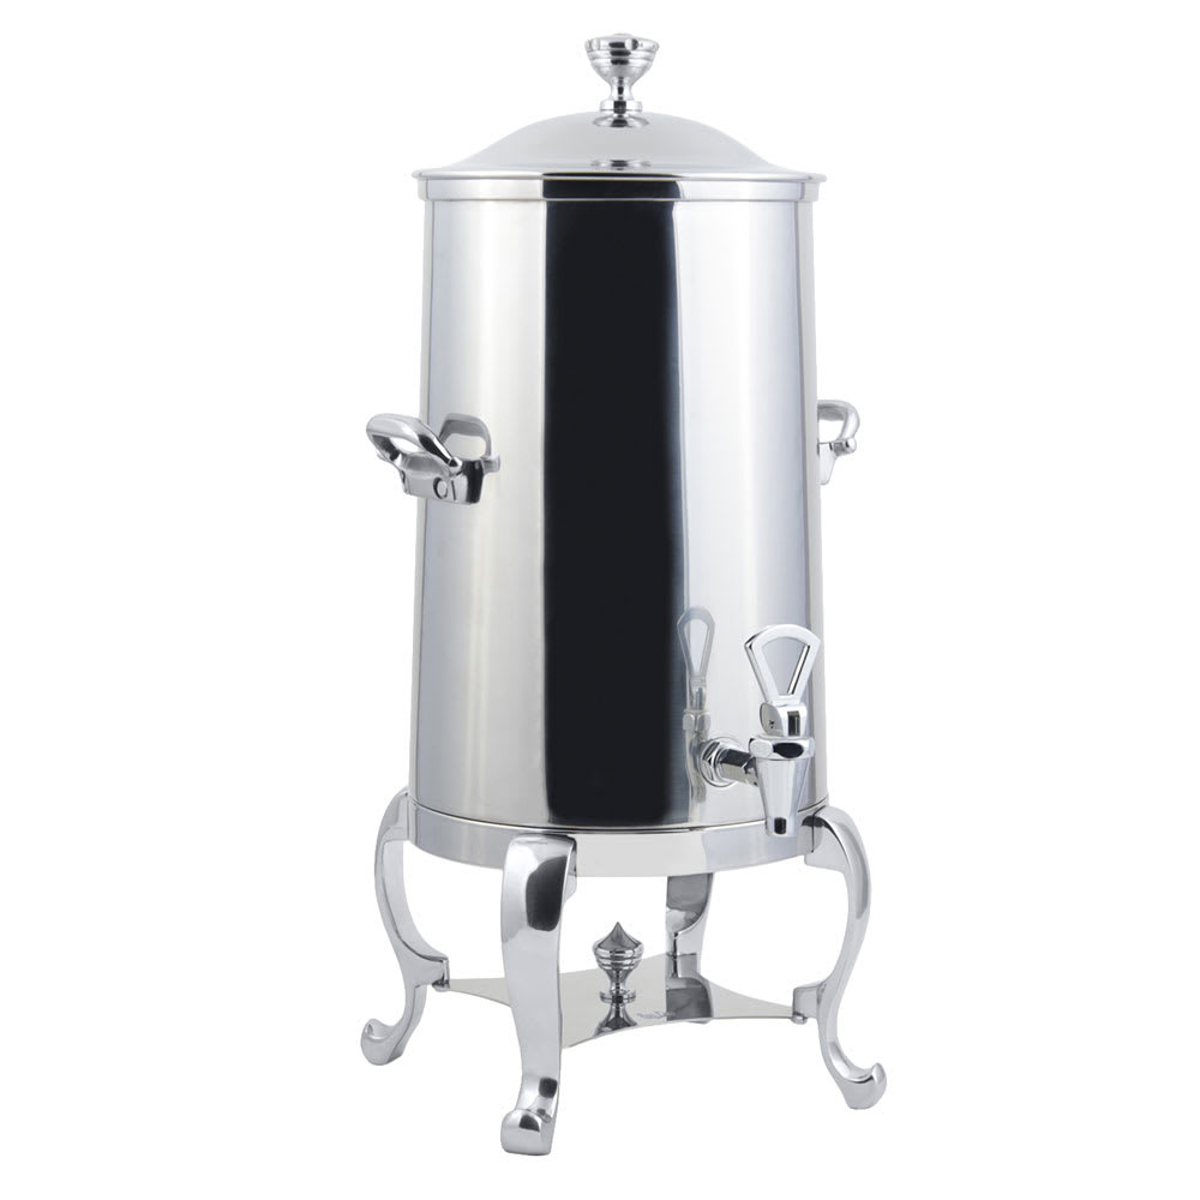 Bon Chef 49001C 1.5 gal Insulated Coffee Urn Server, Chrome, Roman